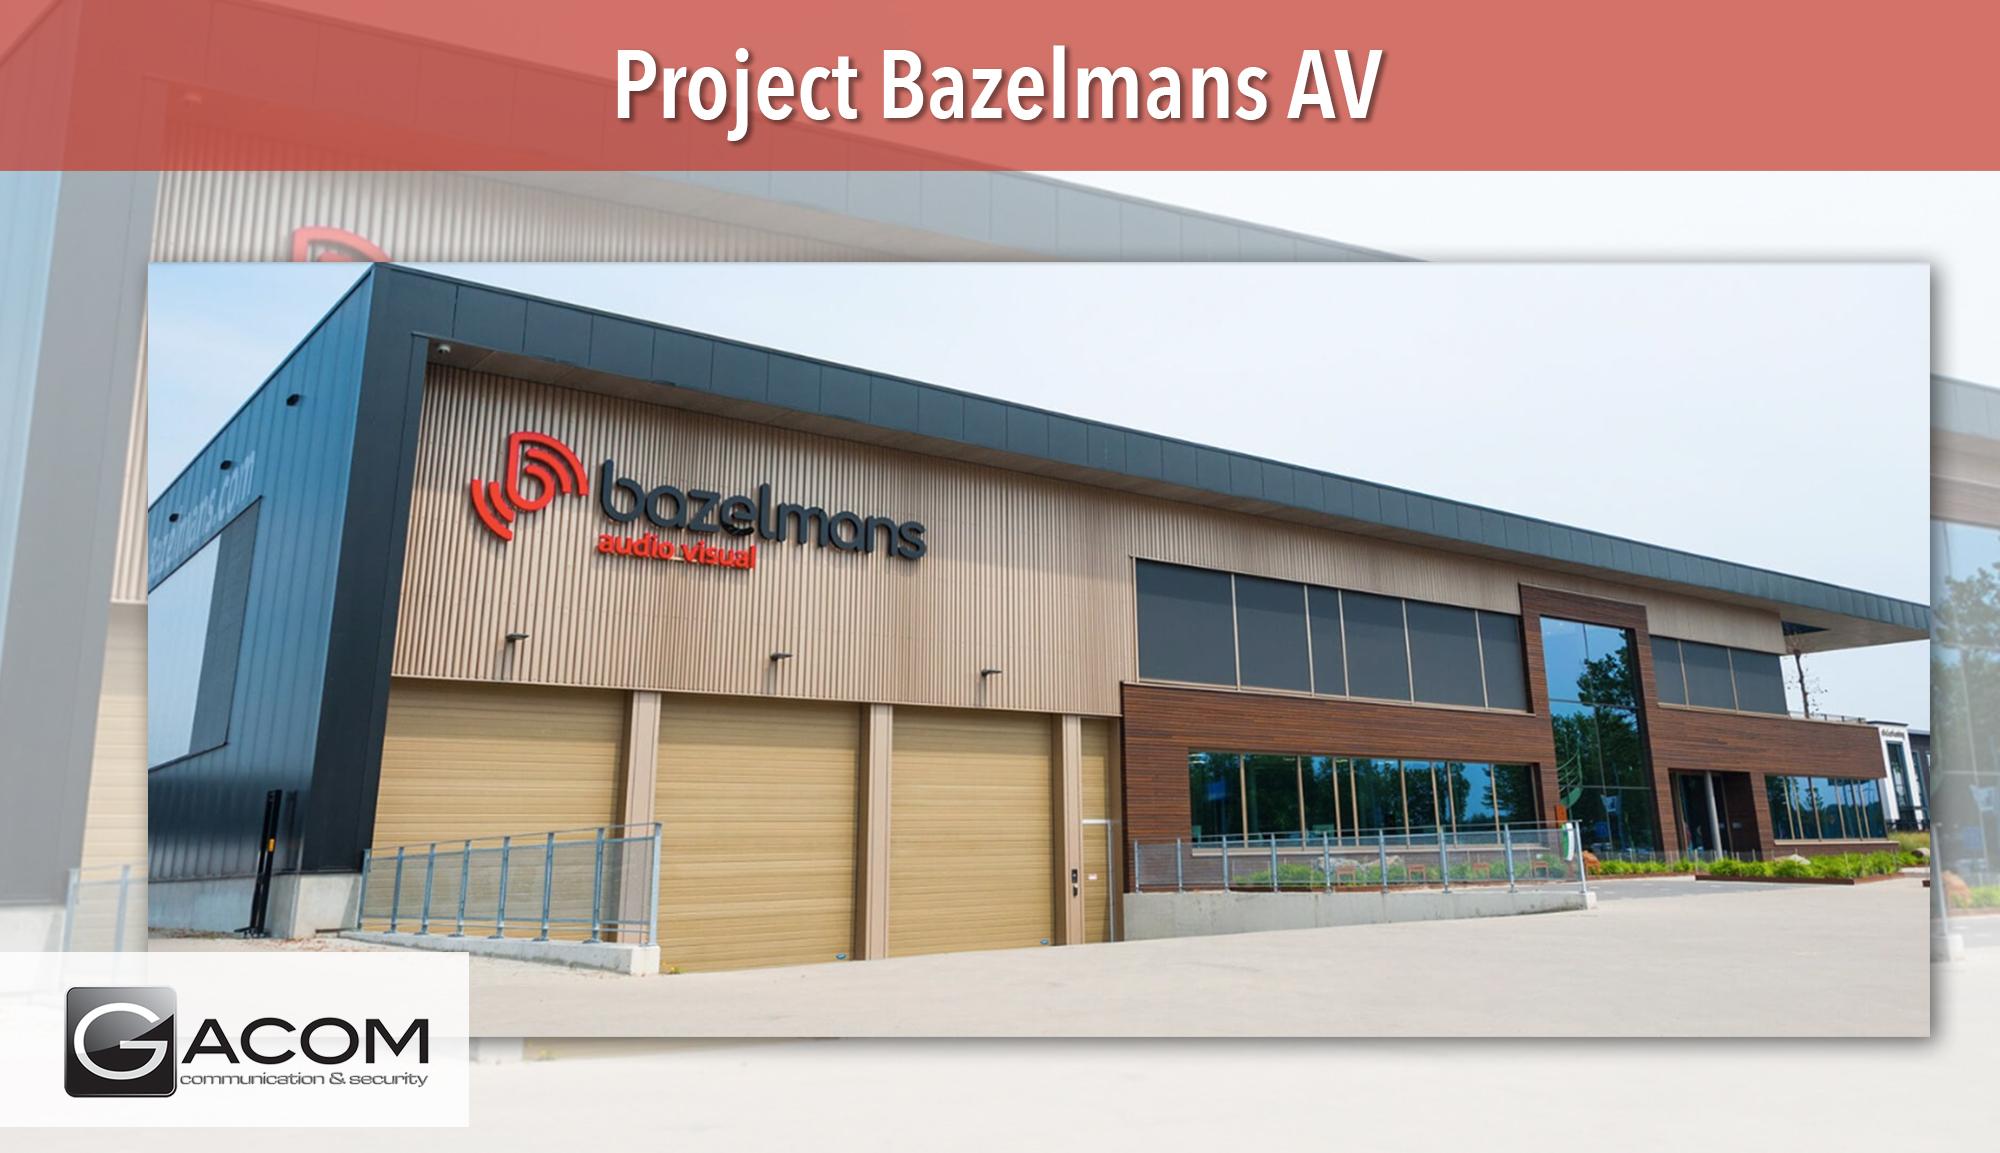 Gacom_Project_Bazelmans